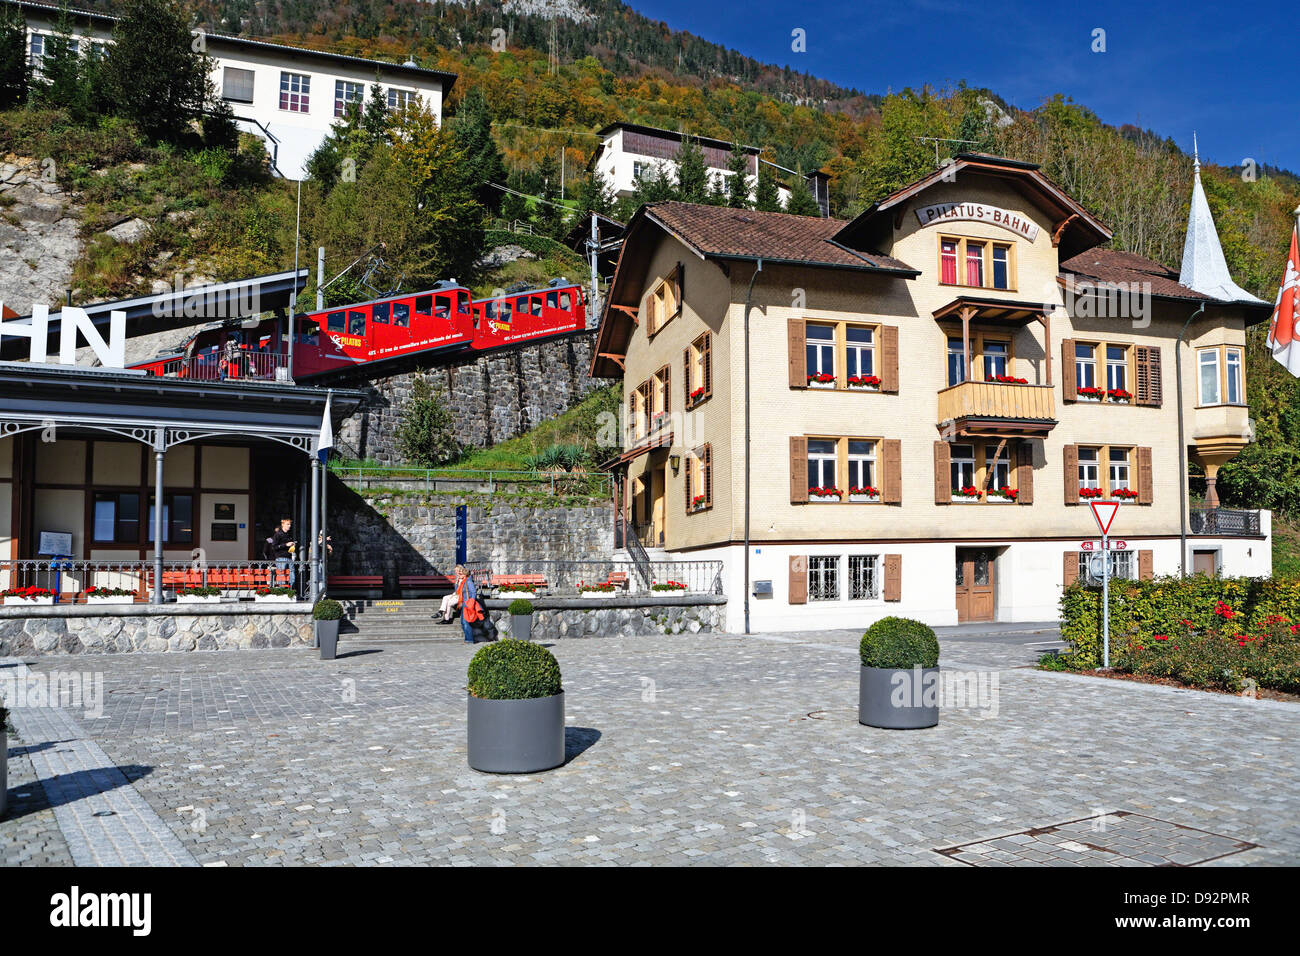 Pilatus Mountain Cogwheel Train Station, Alpnach, Switzerland - Stock Image